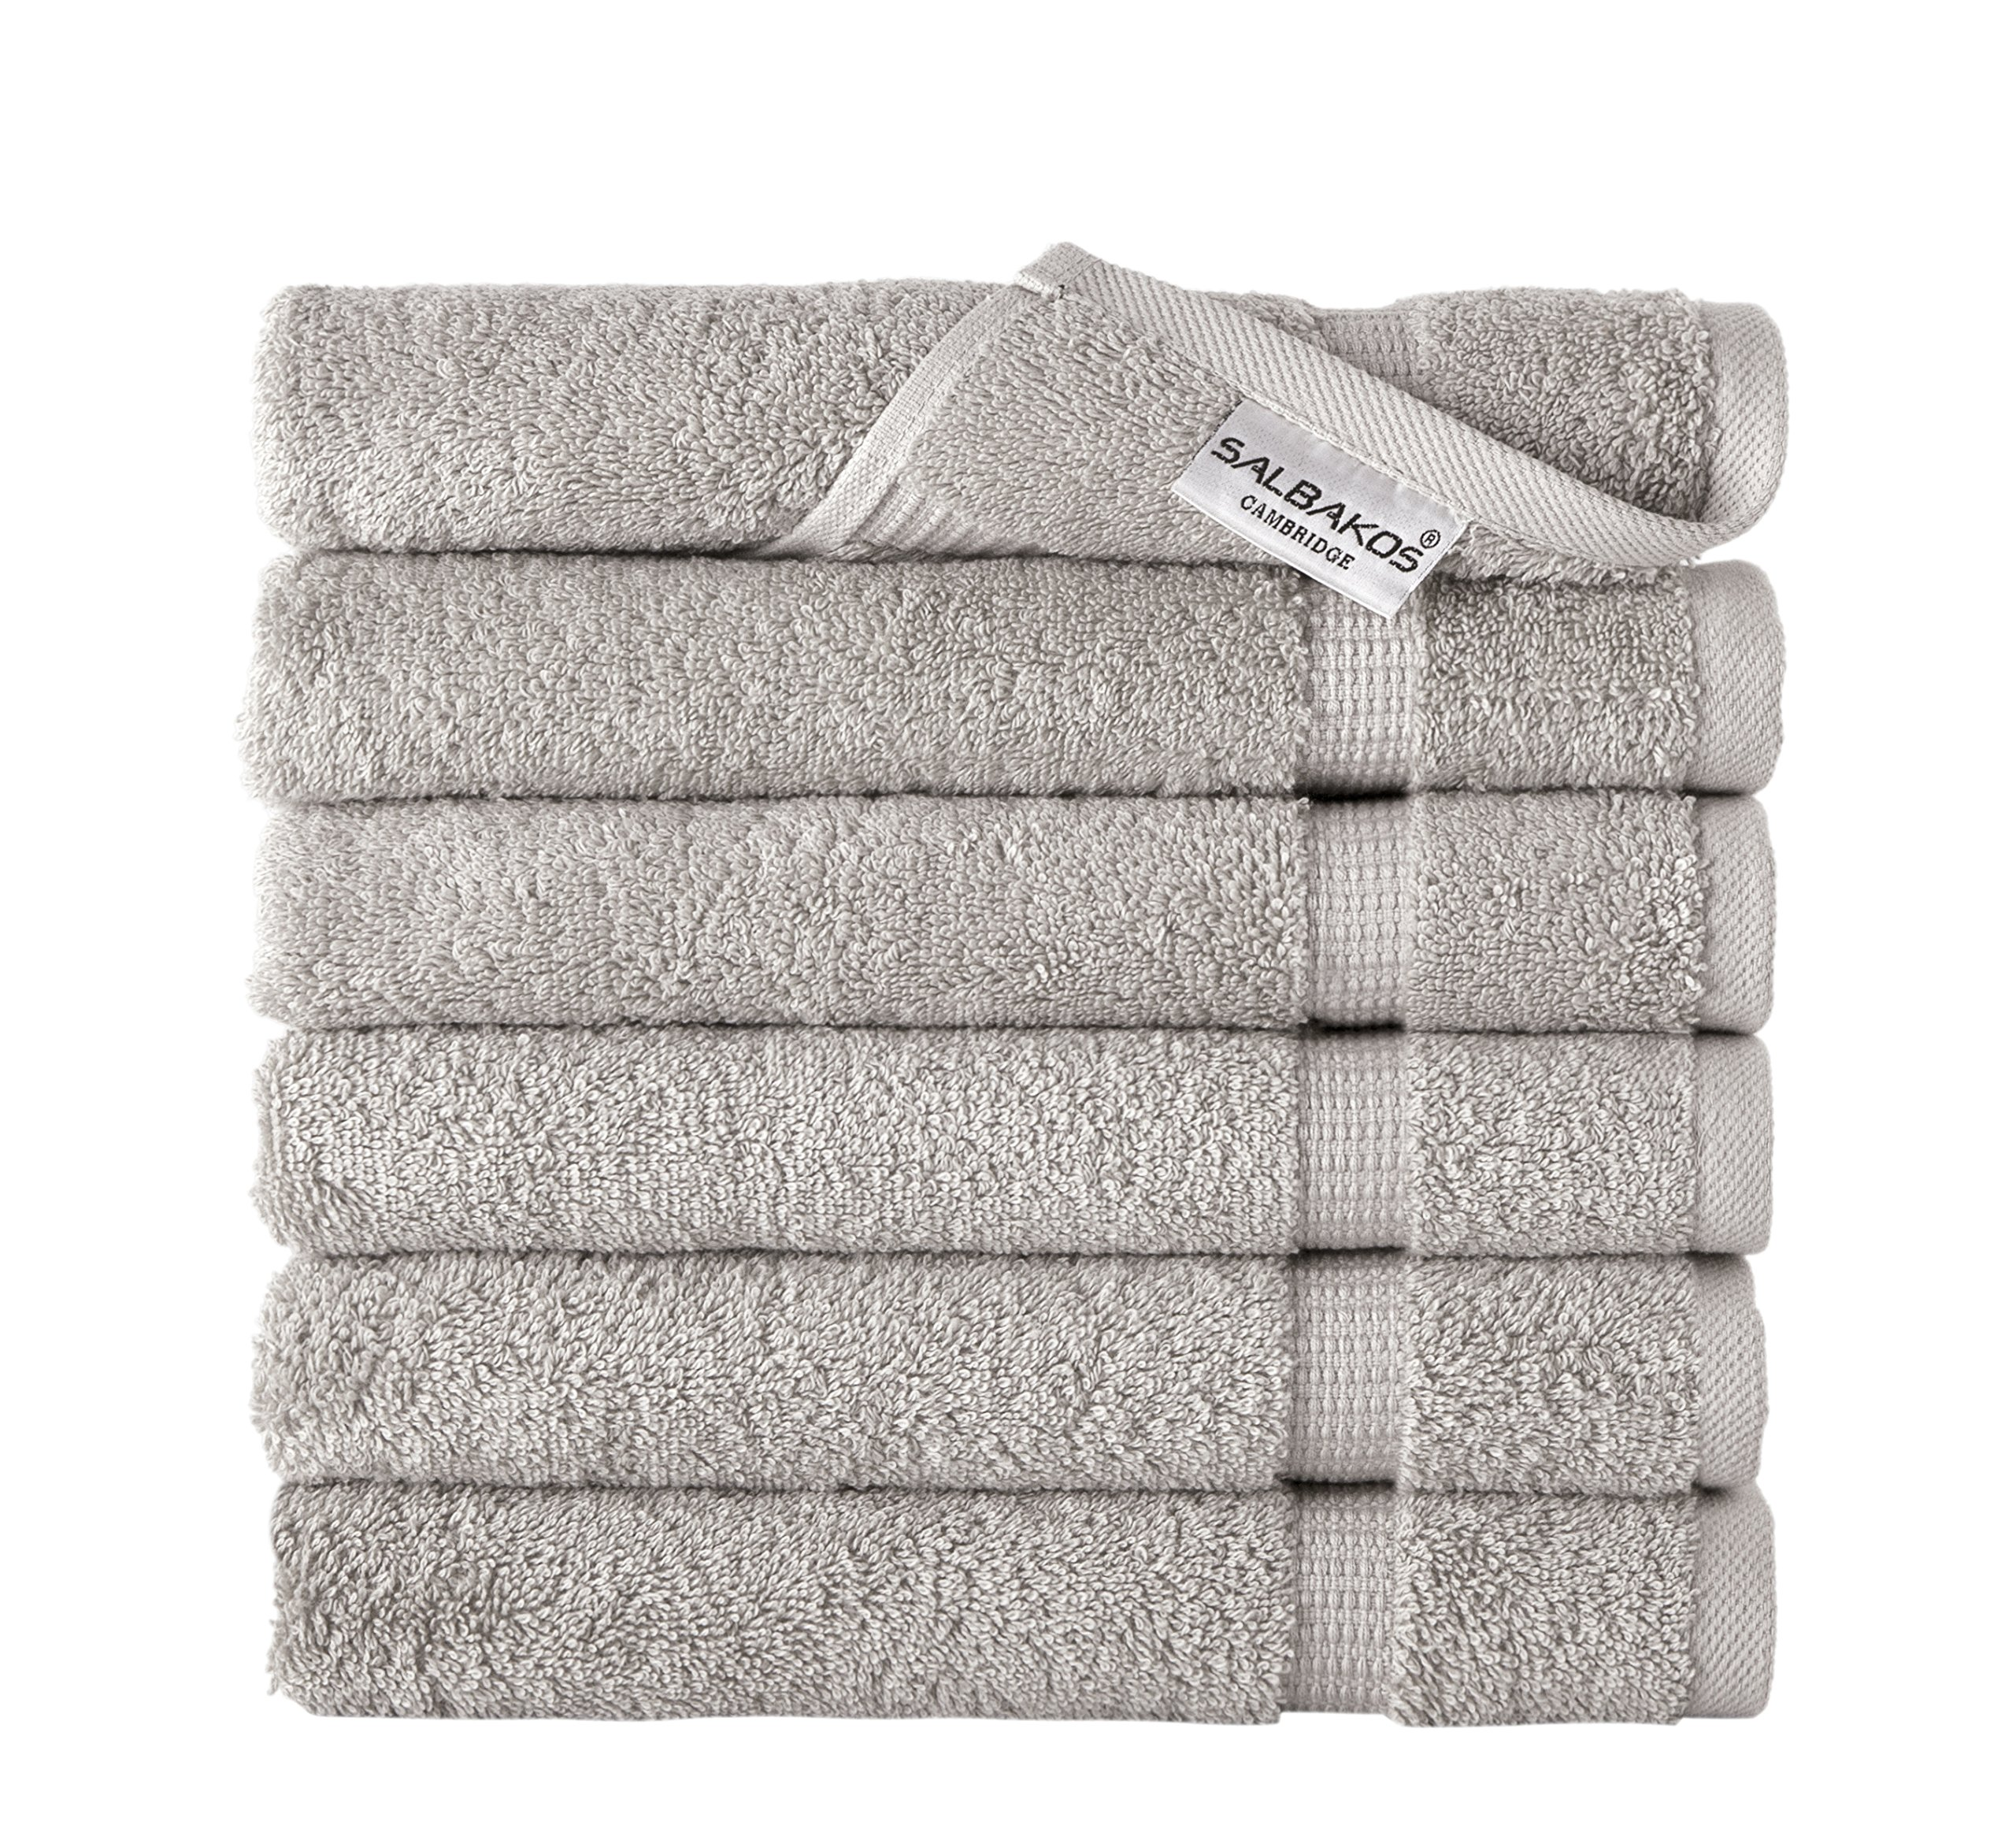 SALBAKOS Luxury Hotel & Spa Turkish Cotton 6-Piece Eco-Friendly Hand Towel Set 16 x 30 Inch, The Silver Gray Color